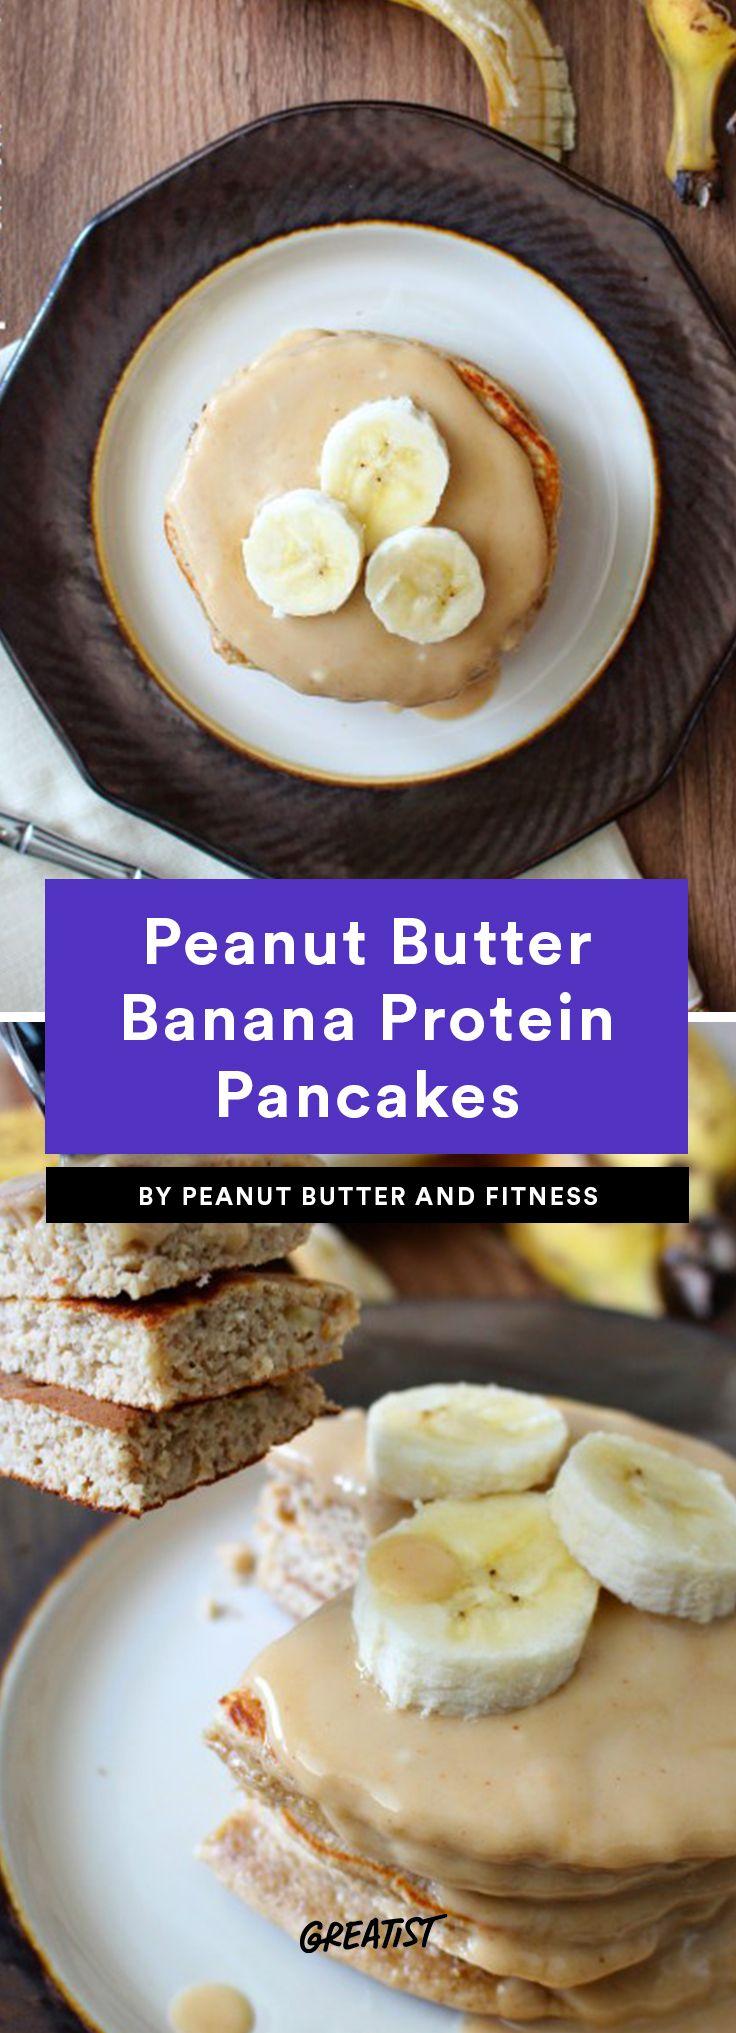 8. Peanut Butter Banana Protein Pancakes #healthy #pancake #recipes https://greatist.com/eat/protein-pancake-recipes